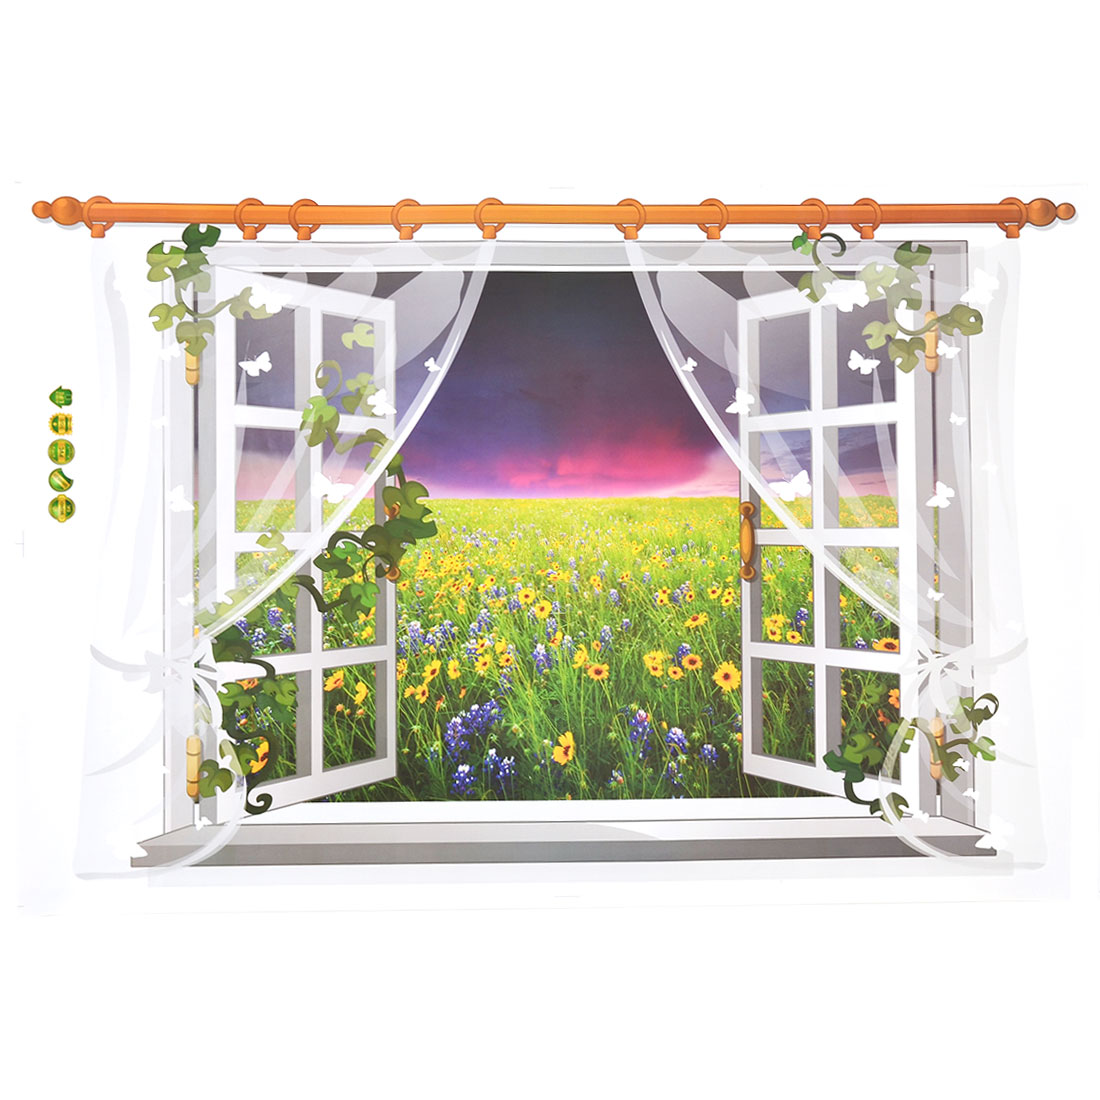 Living Room PVC Flower Print DIY Ornament Wall Sticker Decal Mural 60 x 90cm